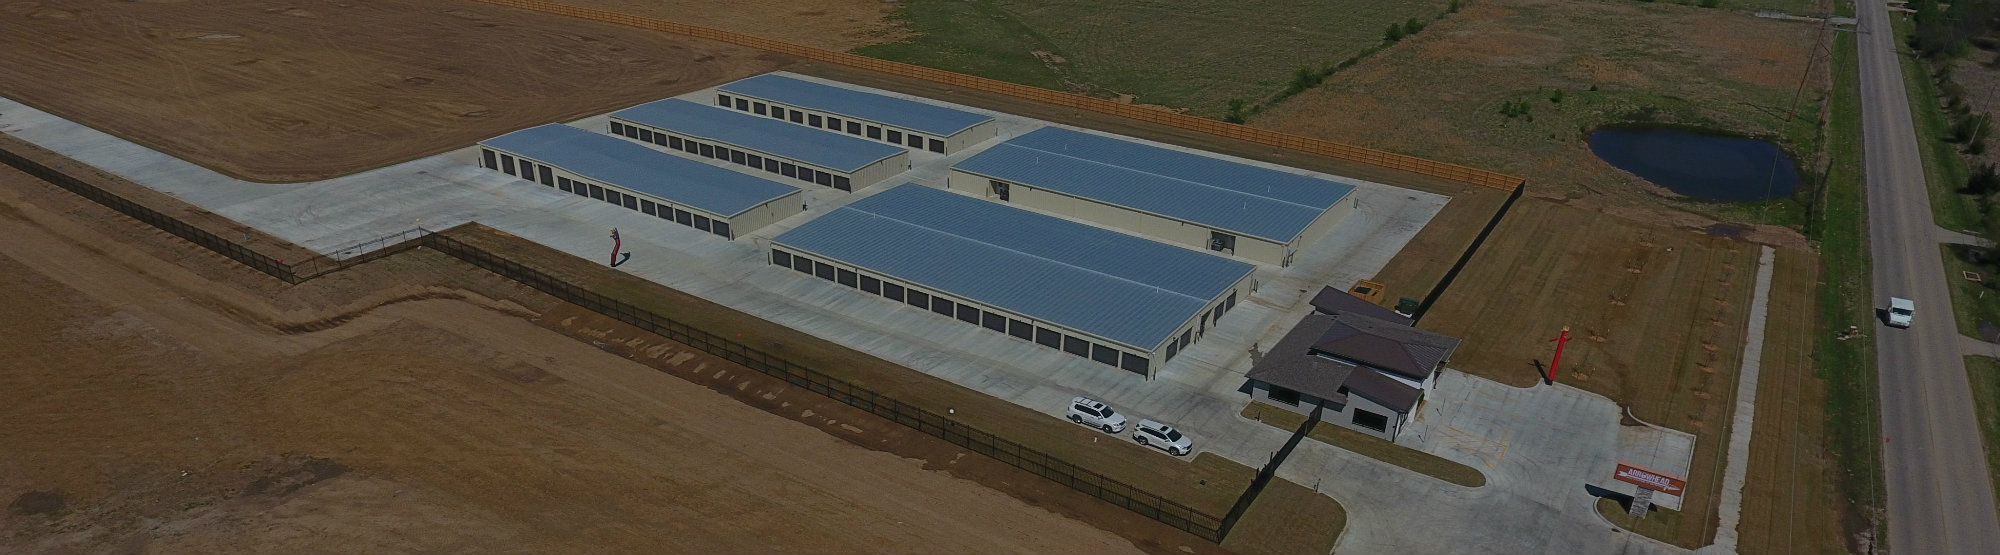 Overhead view of Arrowhead Self Storage units in Glenpool, OK